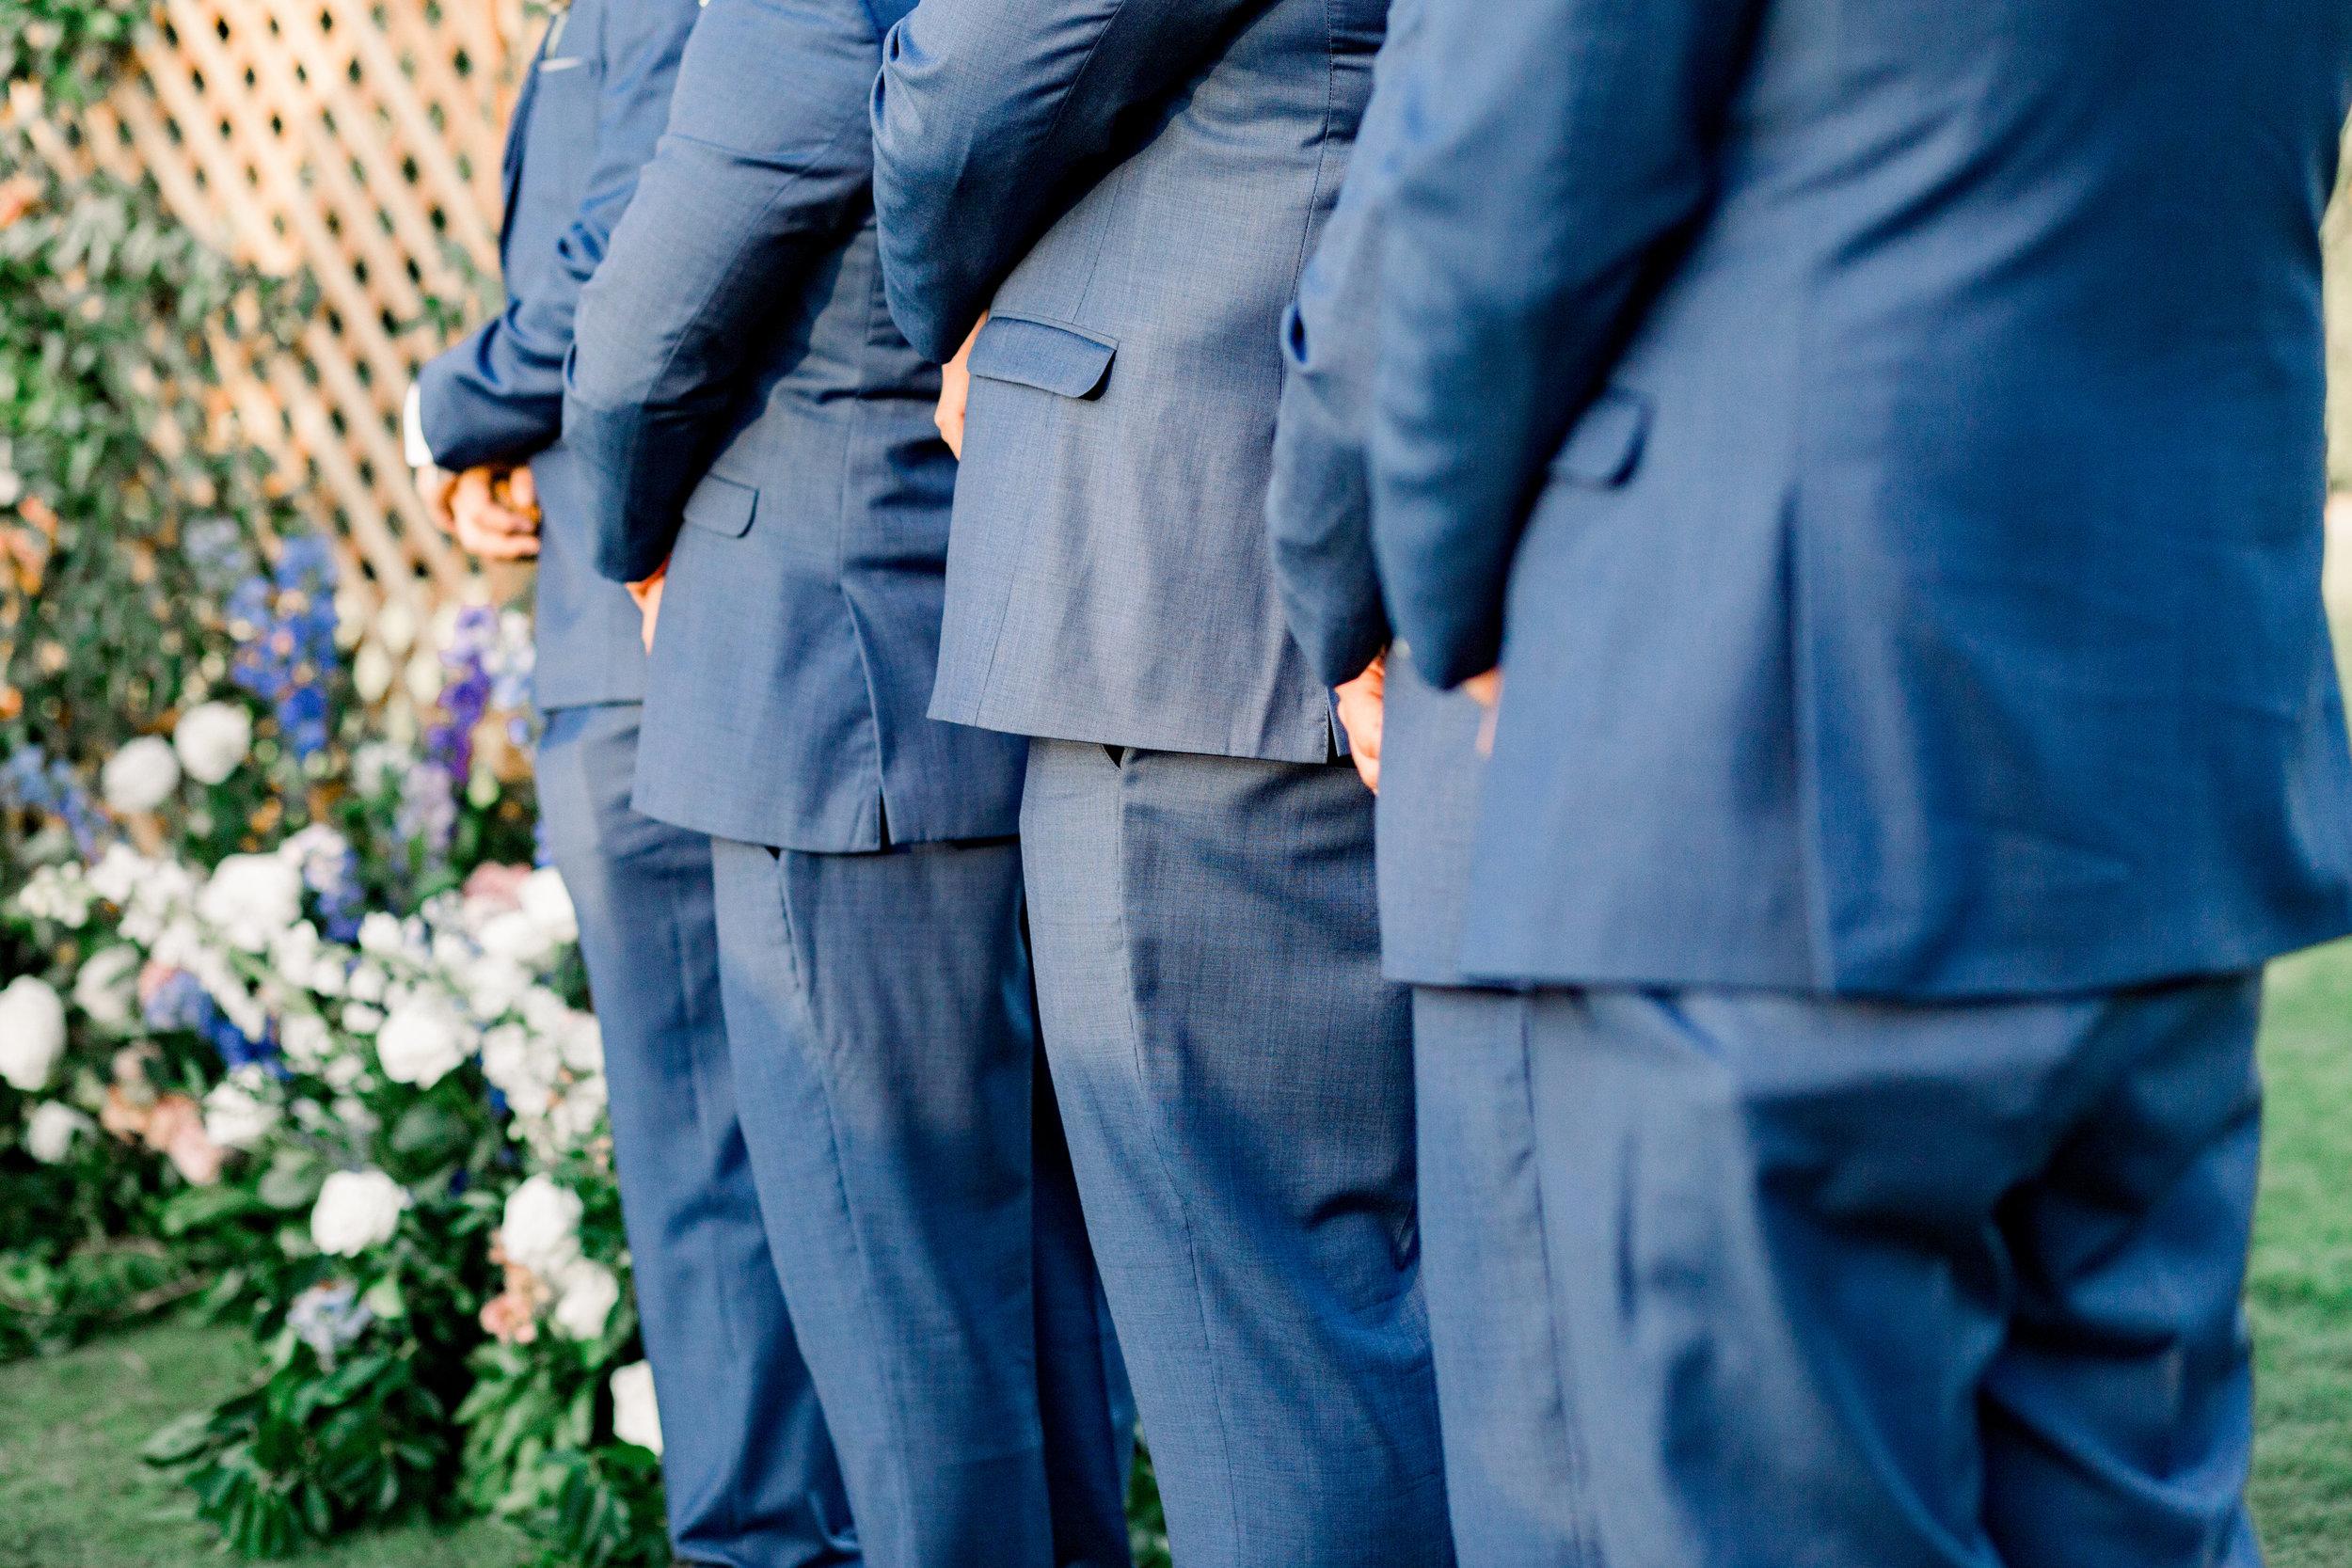 Ceremony-0683.jpg